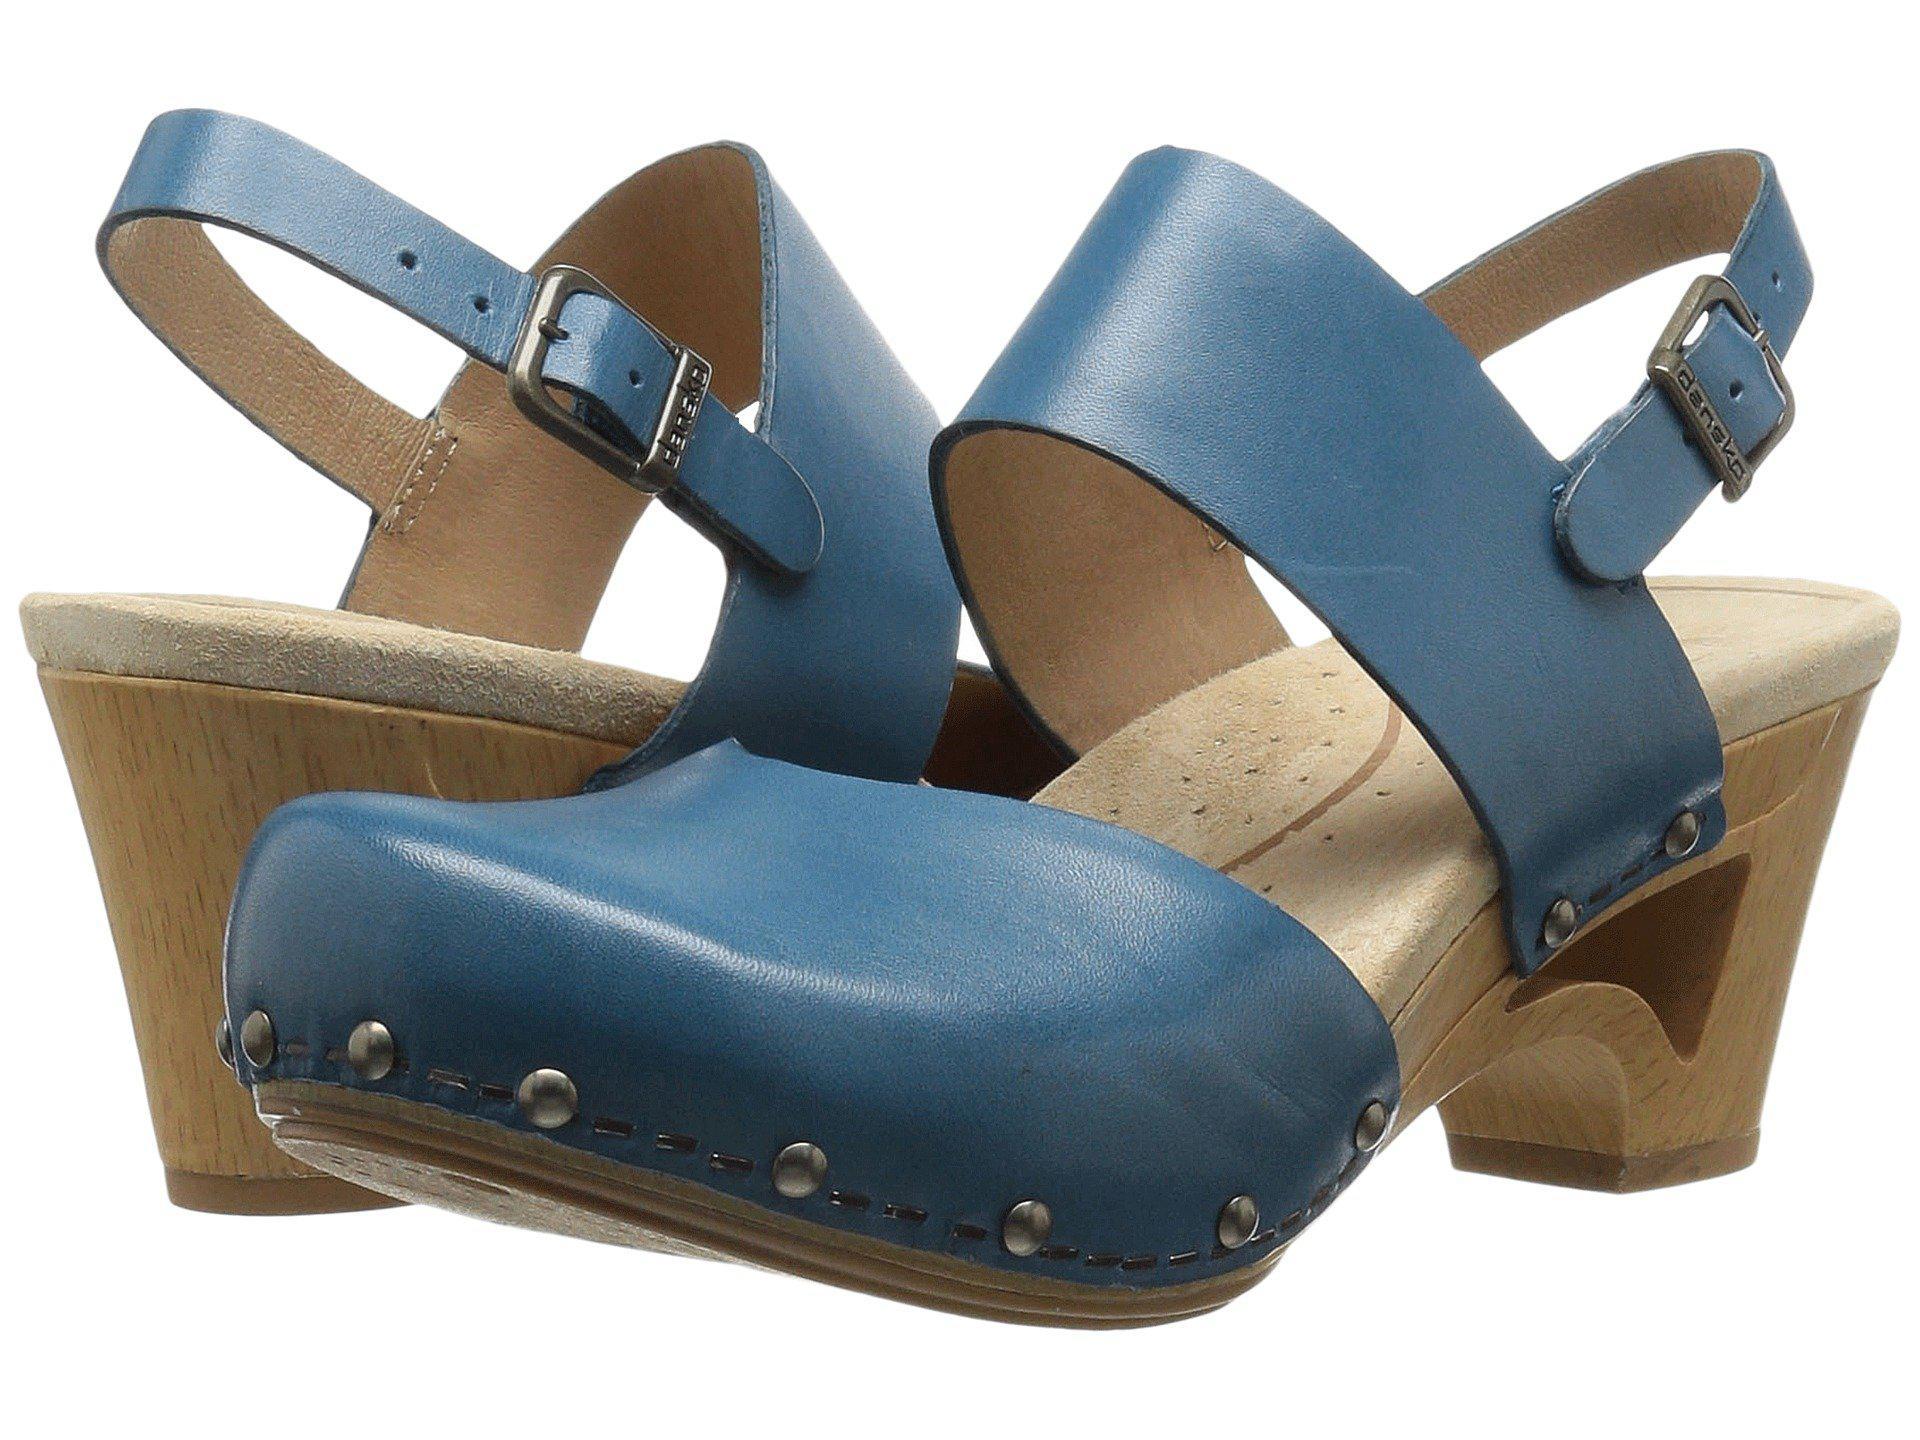 Thea Xbqcrwdeo Dansko Blue In Lyst 8ONwnvm0